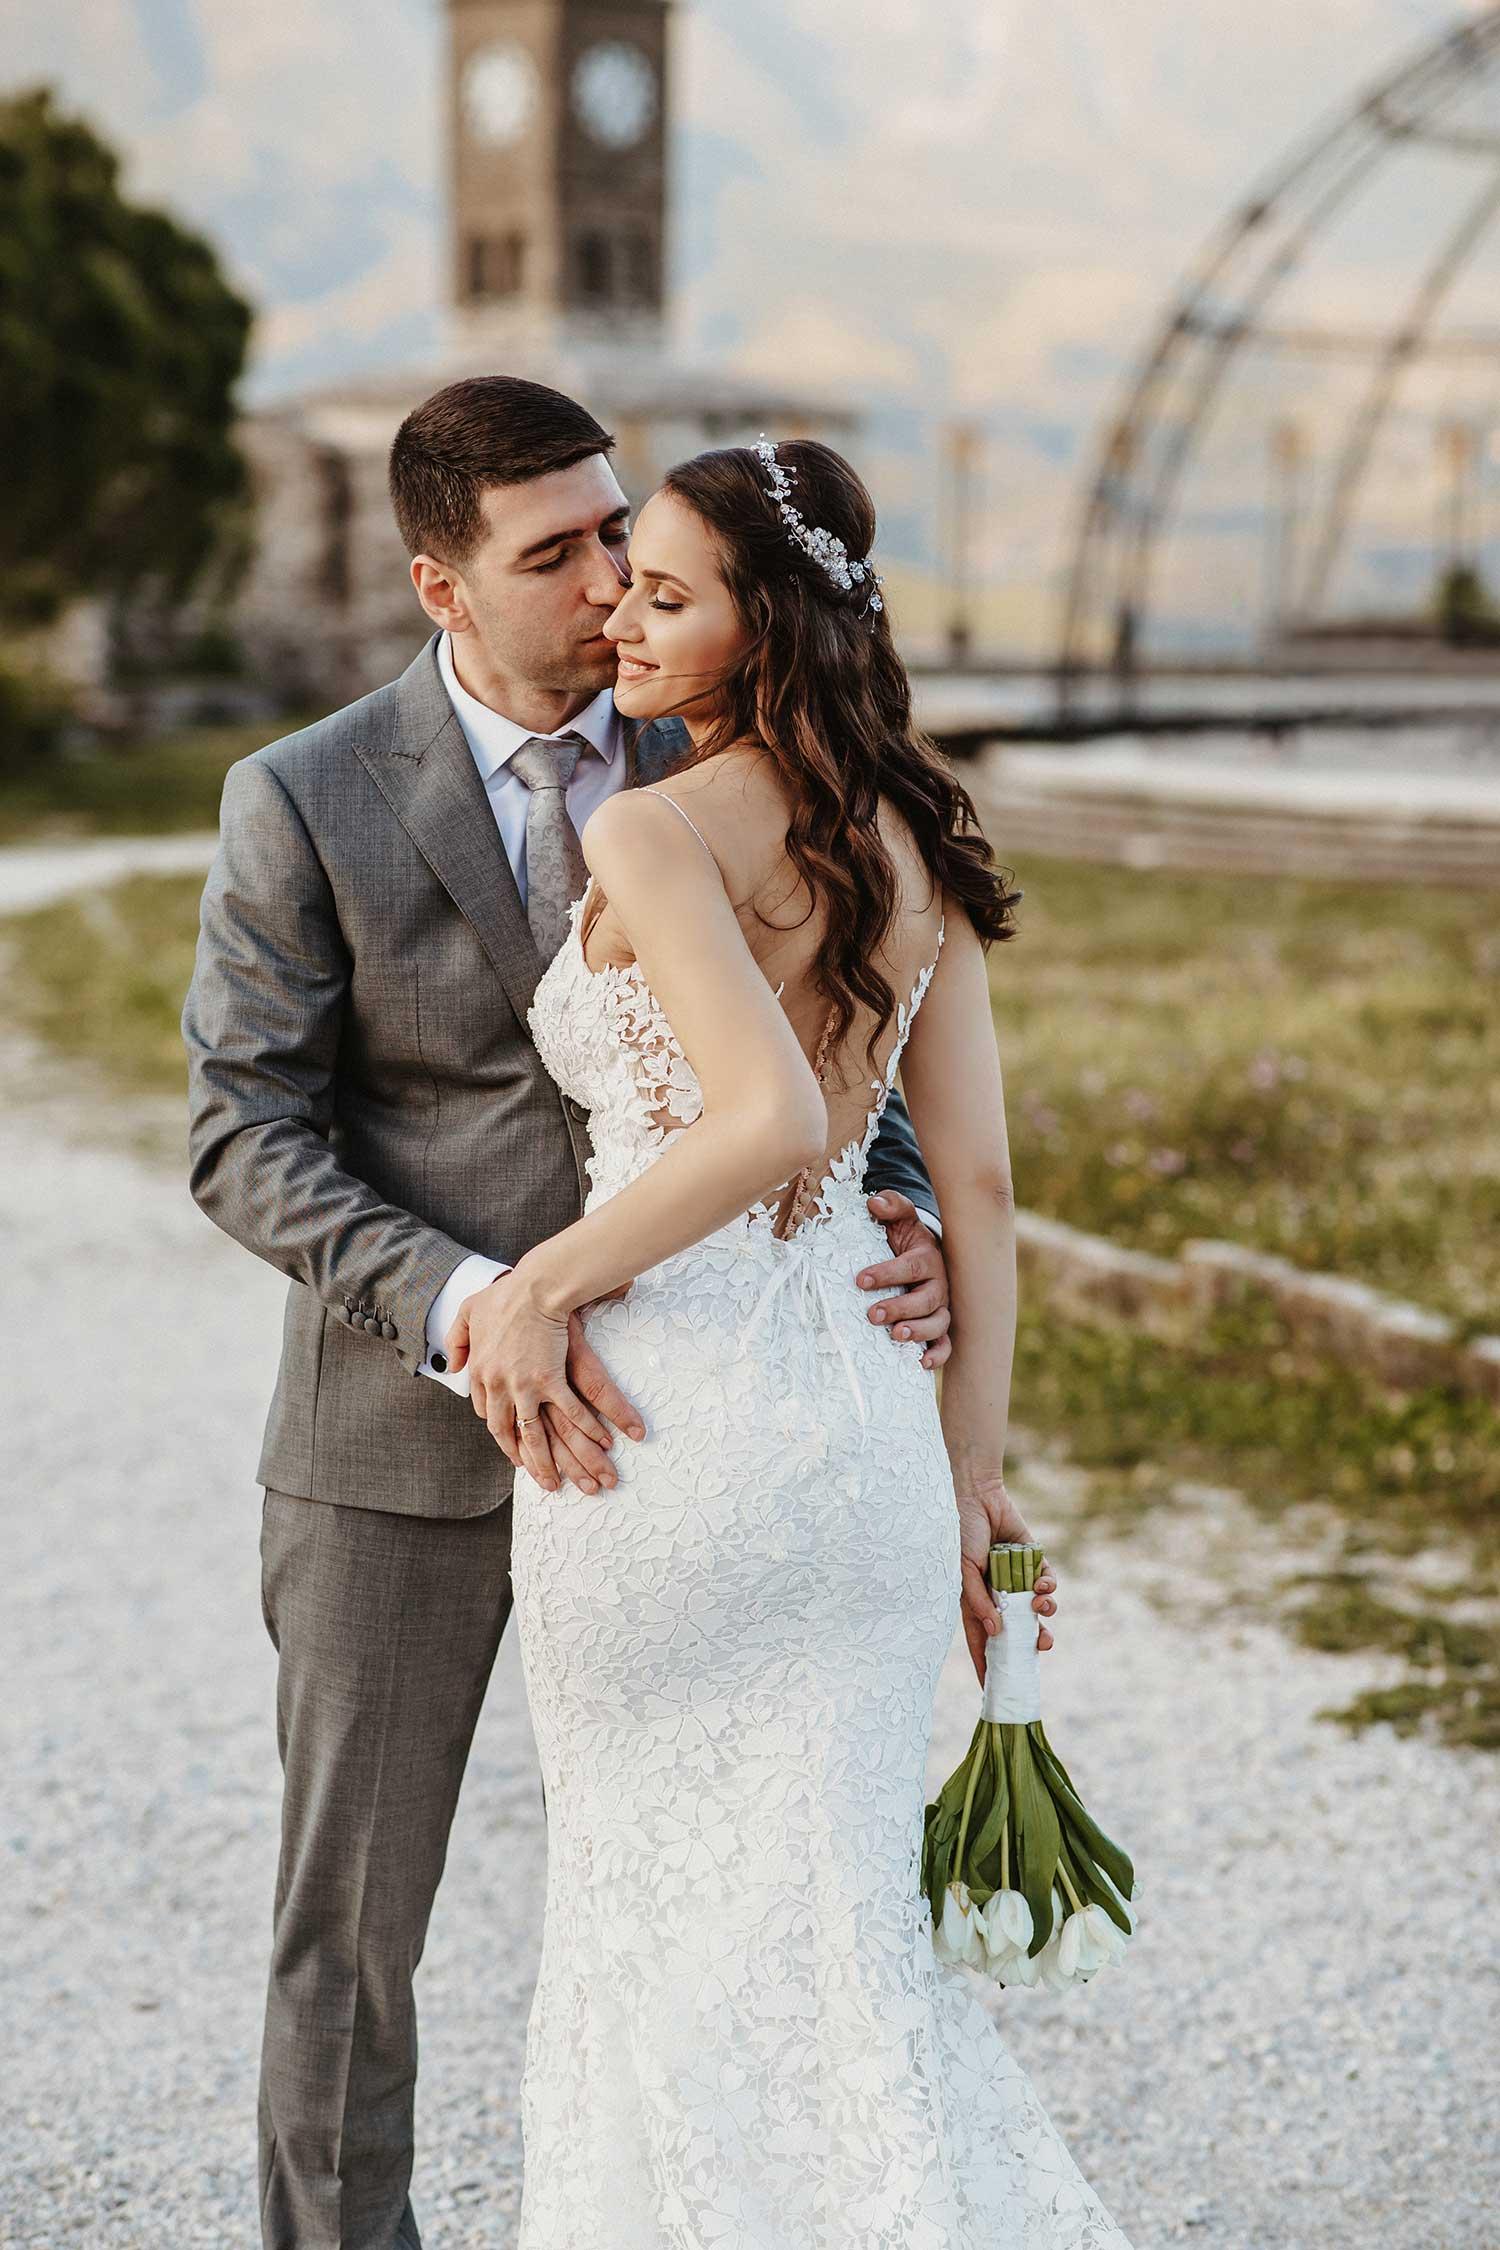 Bride and groom sharing their love in Gjirokaster's castle